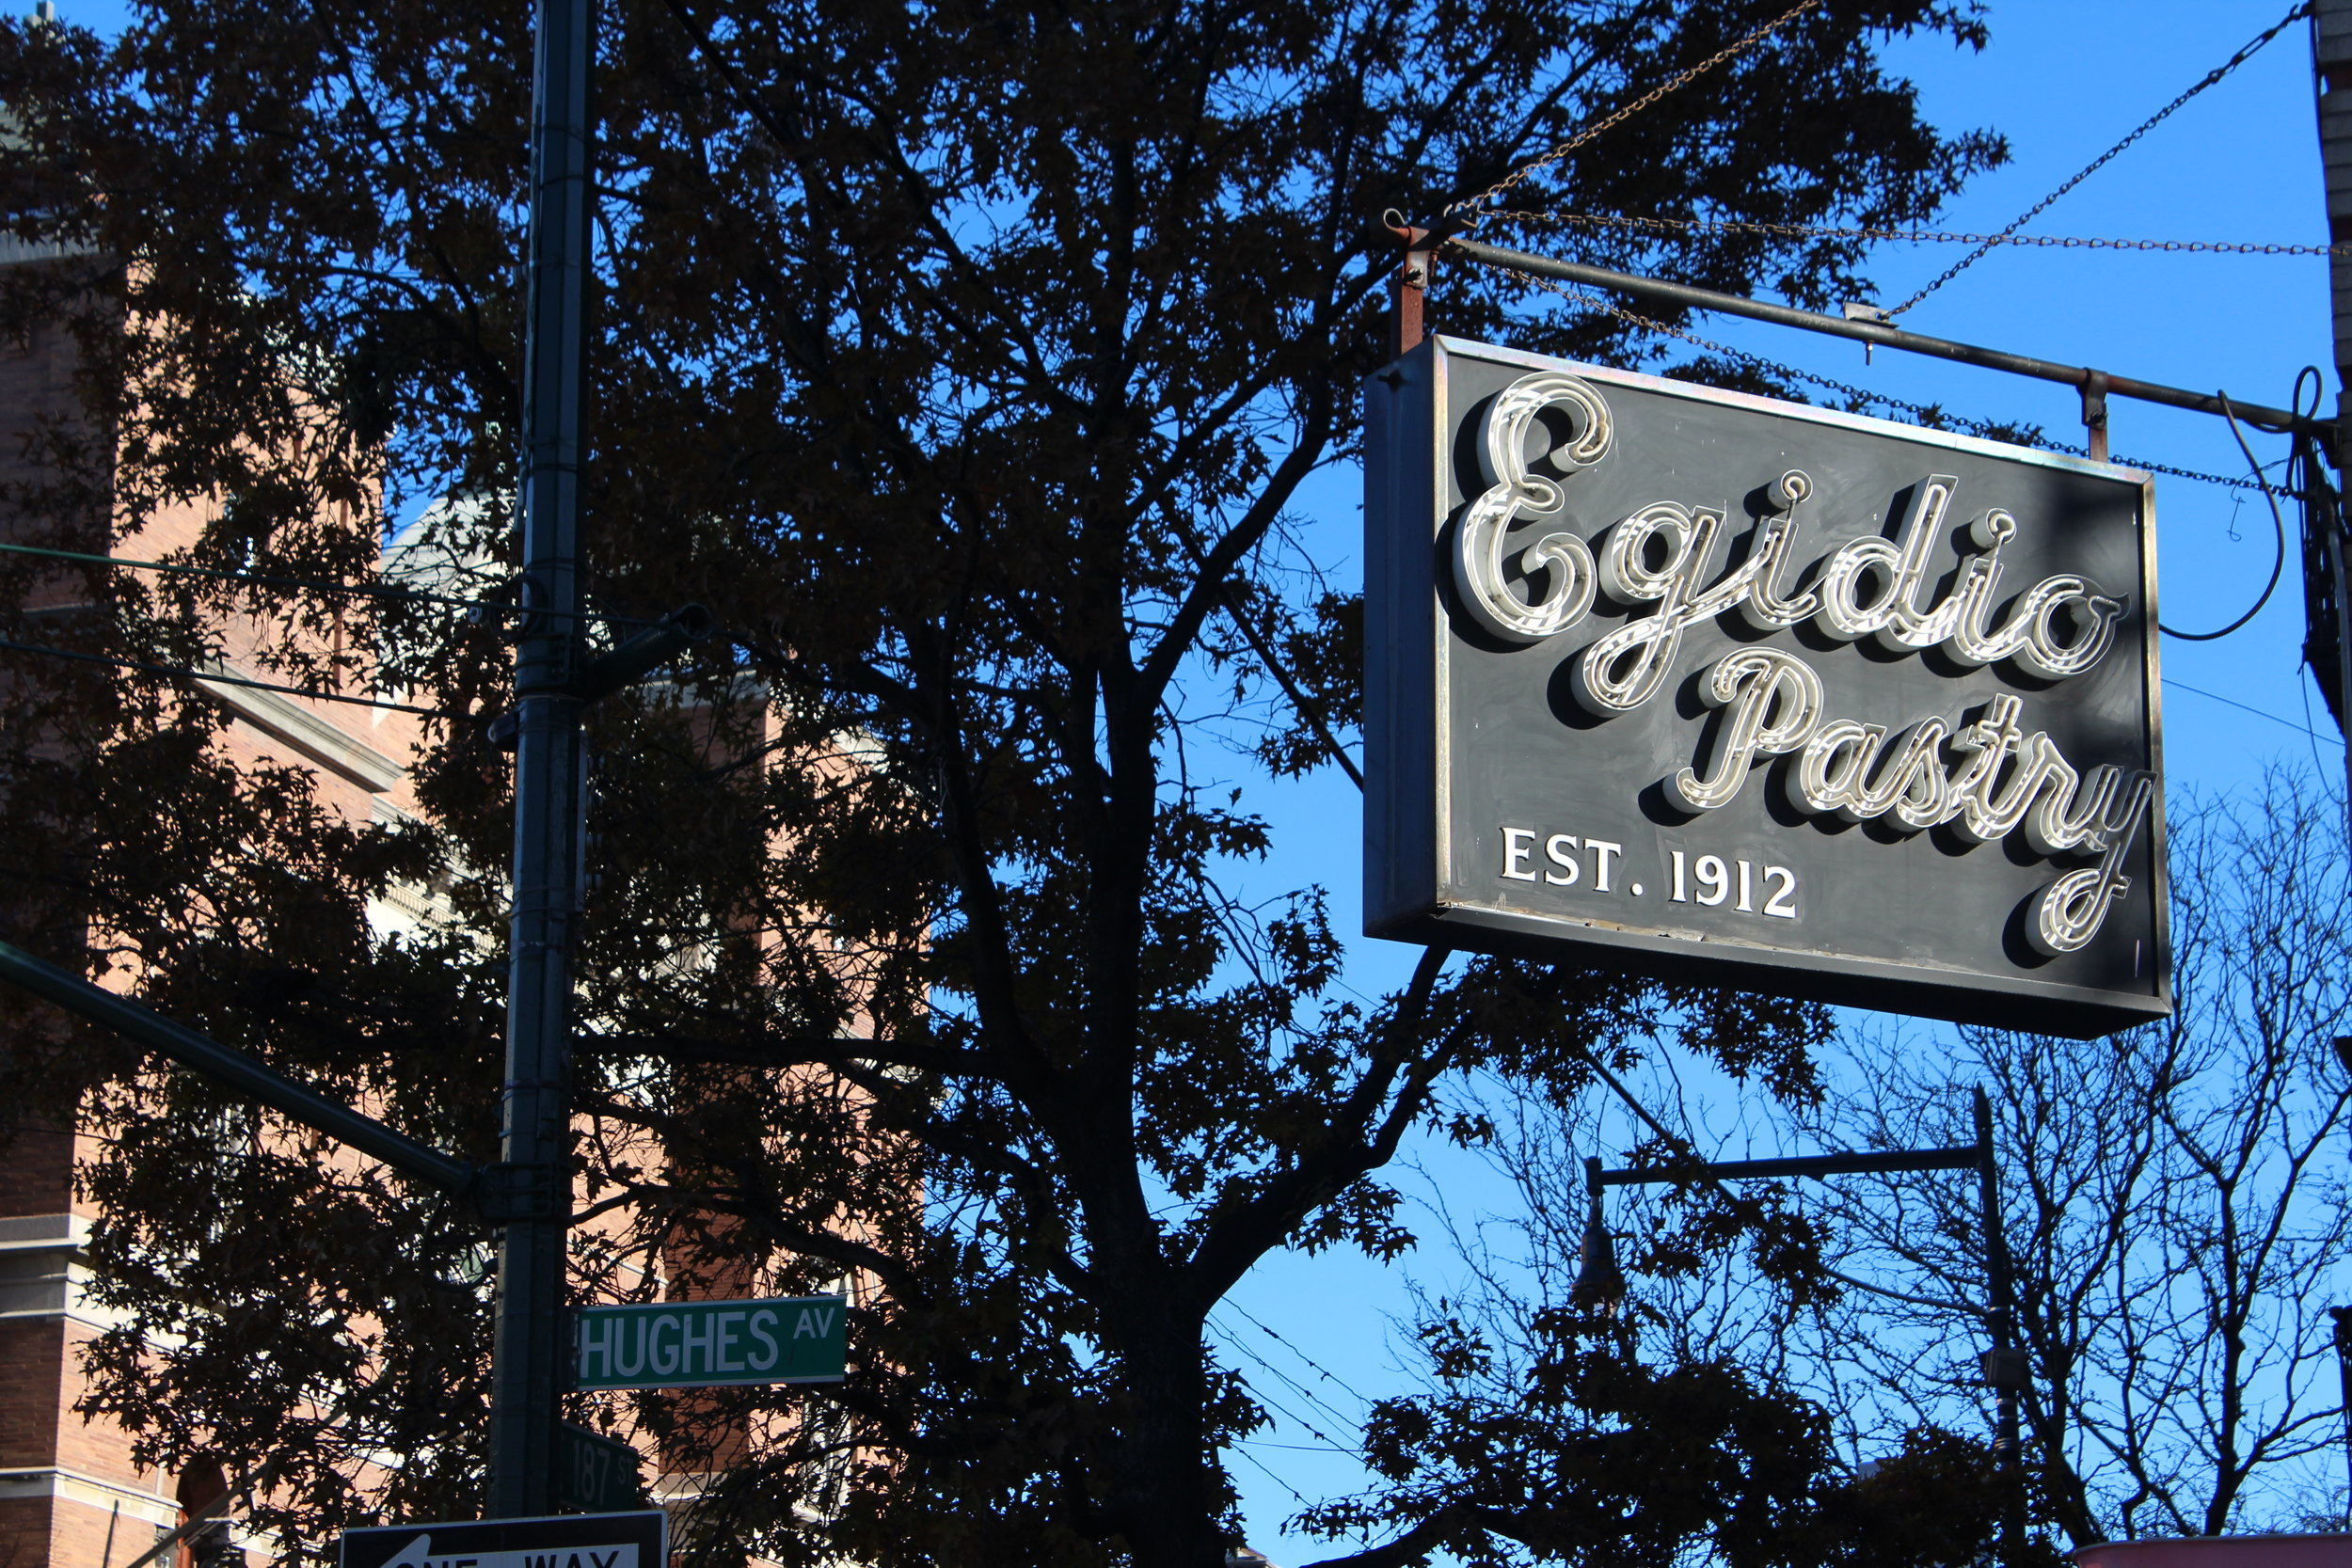 Egidio's Pastry Shop on 187th Street and Hughes Avenue, right near Arthur Avenue in the Bronx